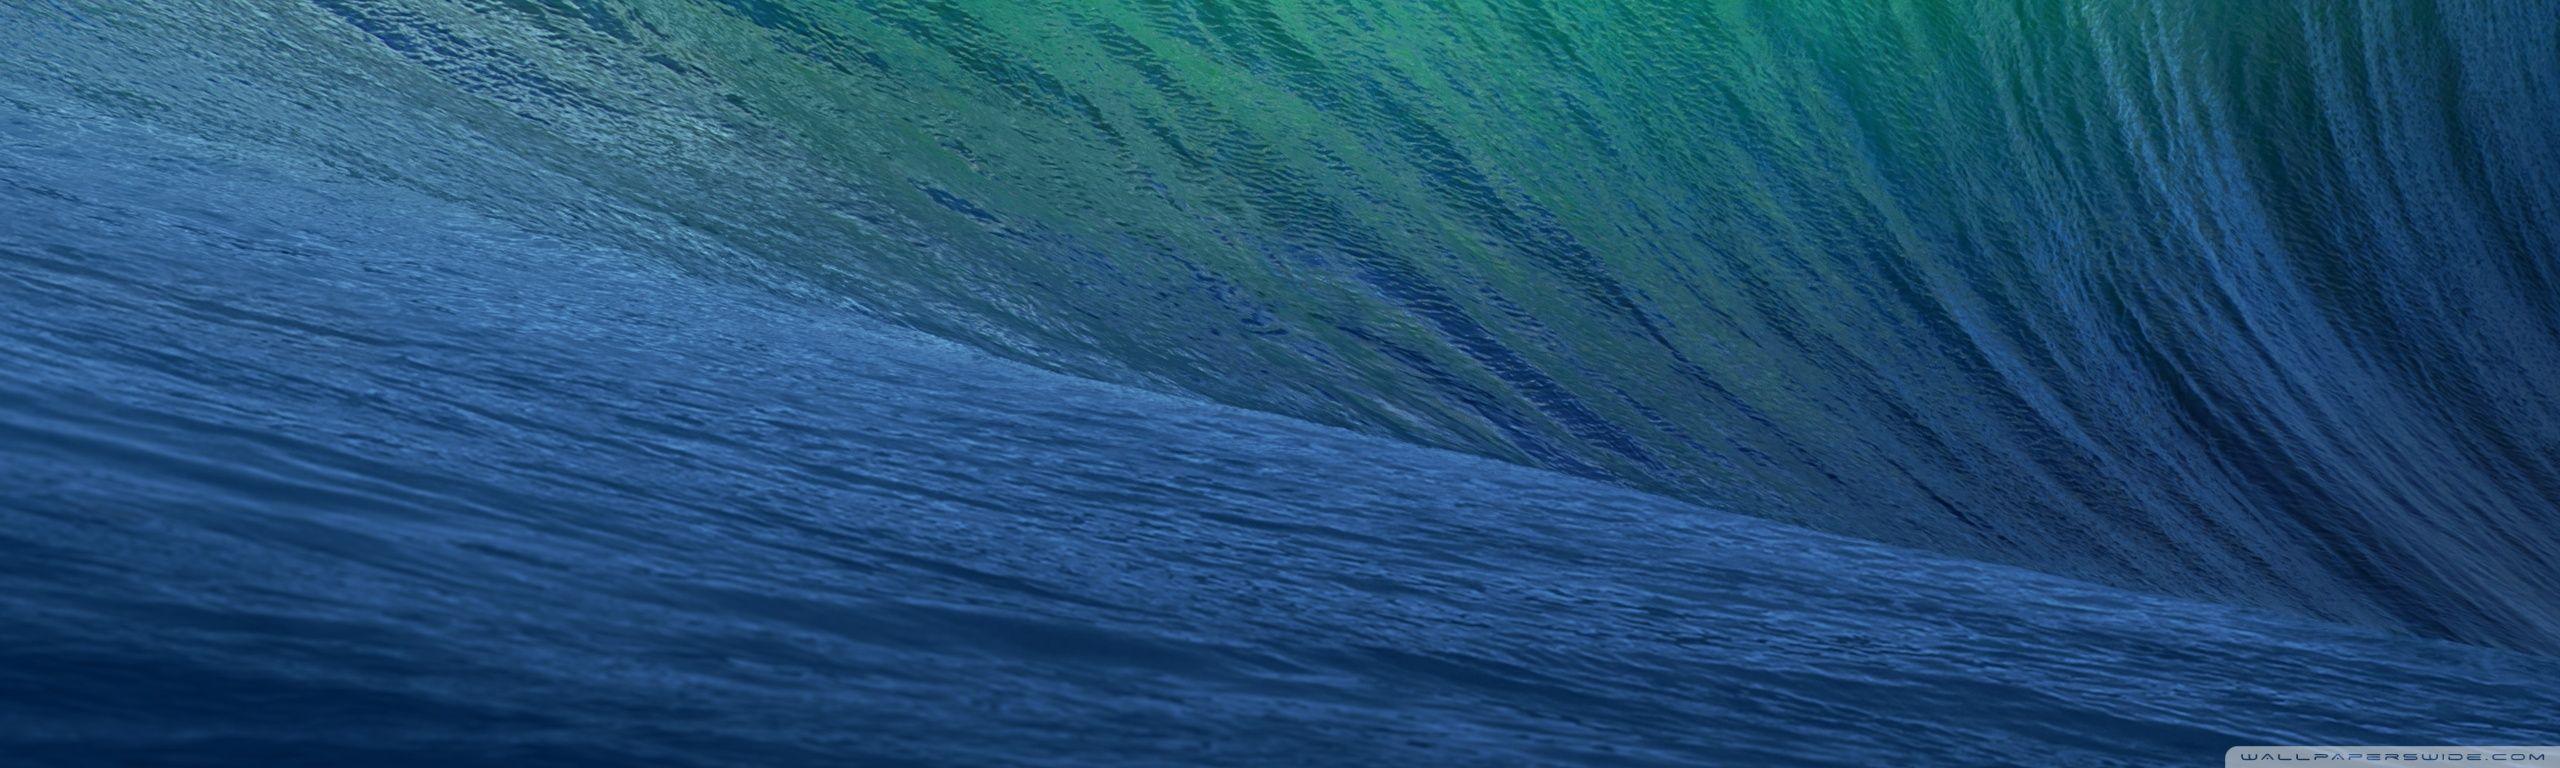 mac os x mavericks wallpaper | images wallpapers | pinterest